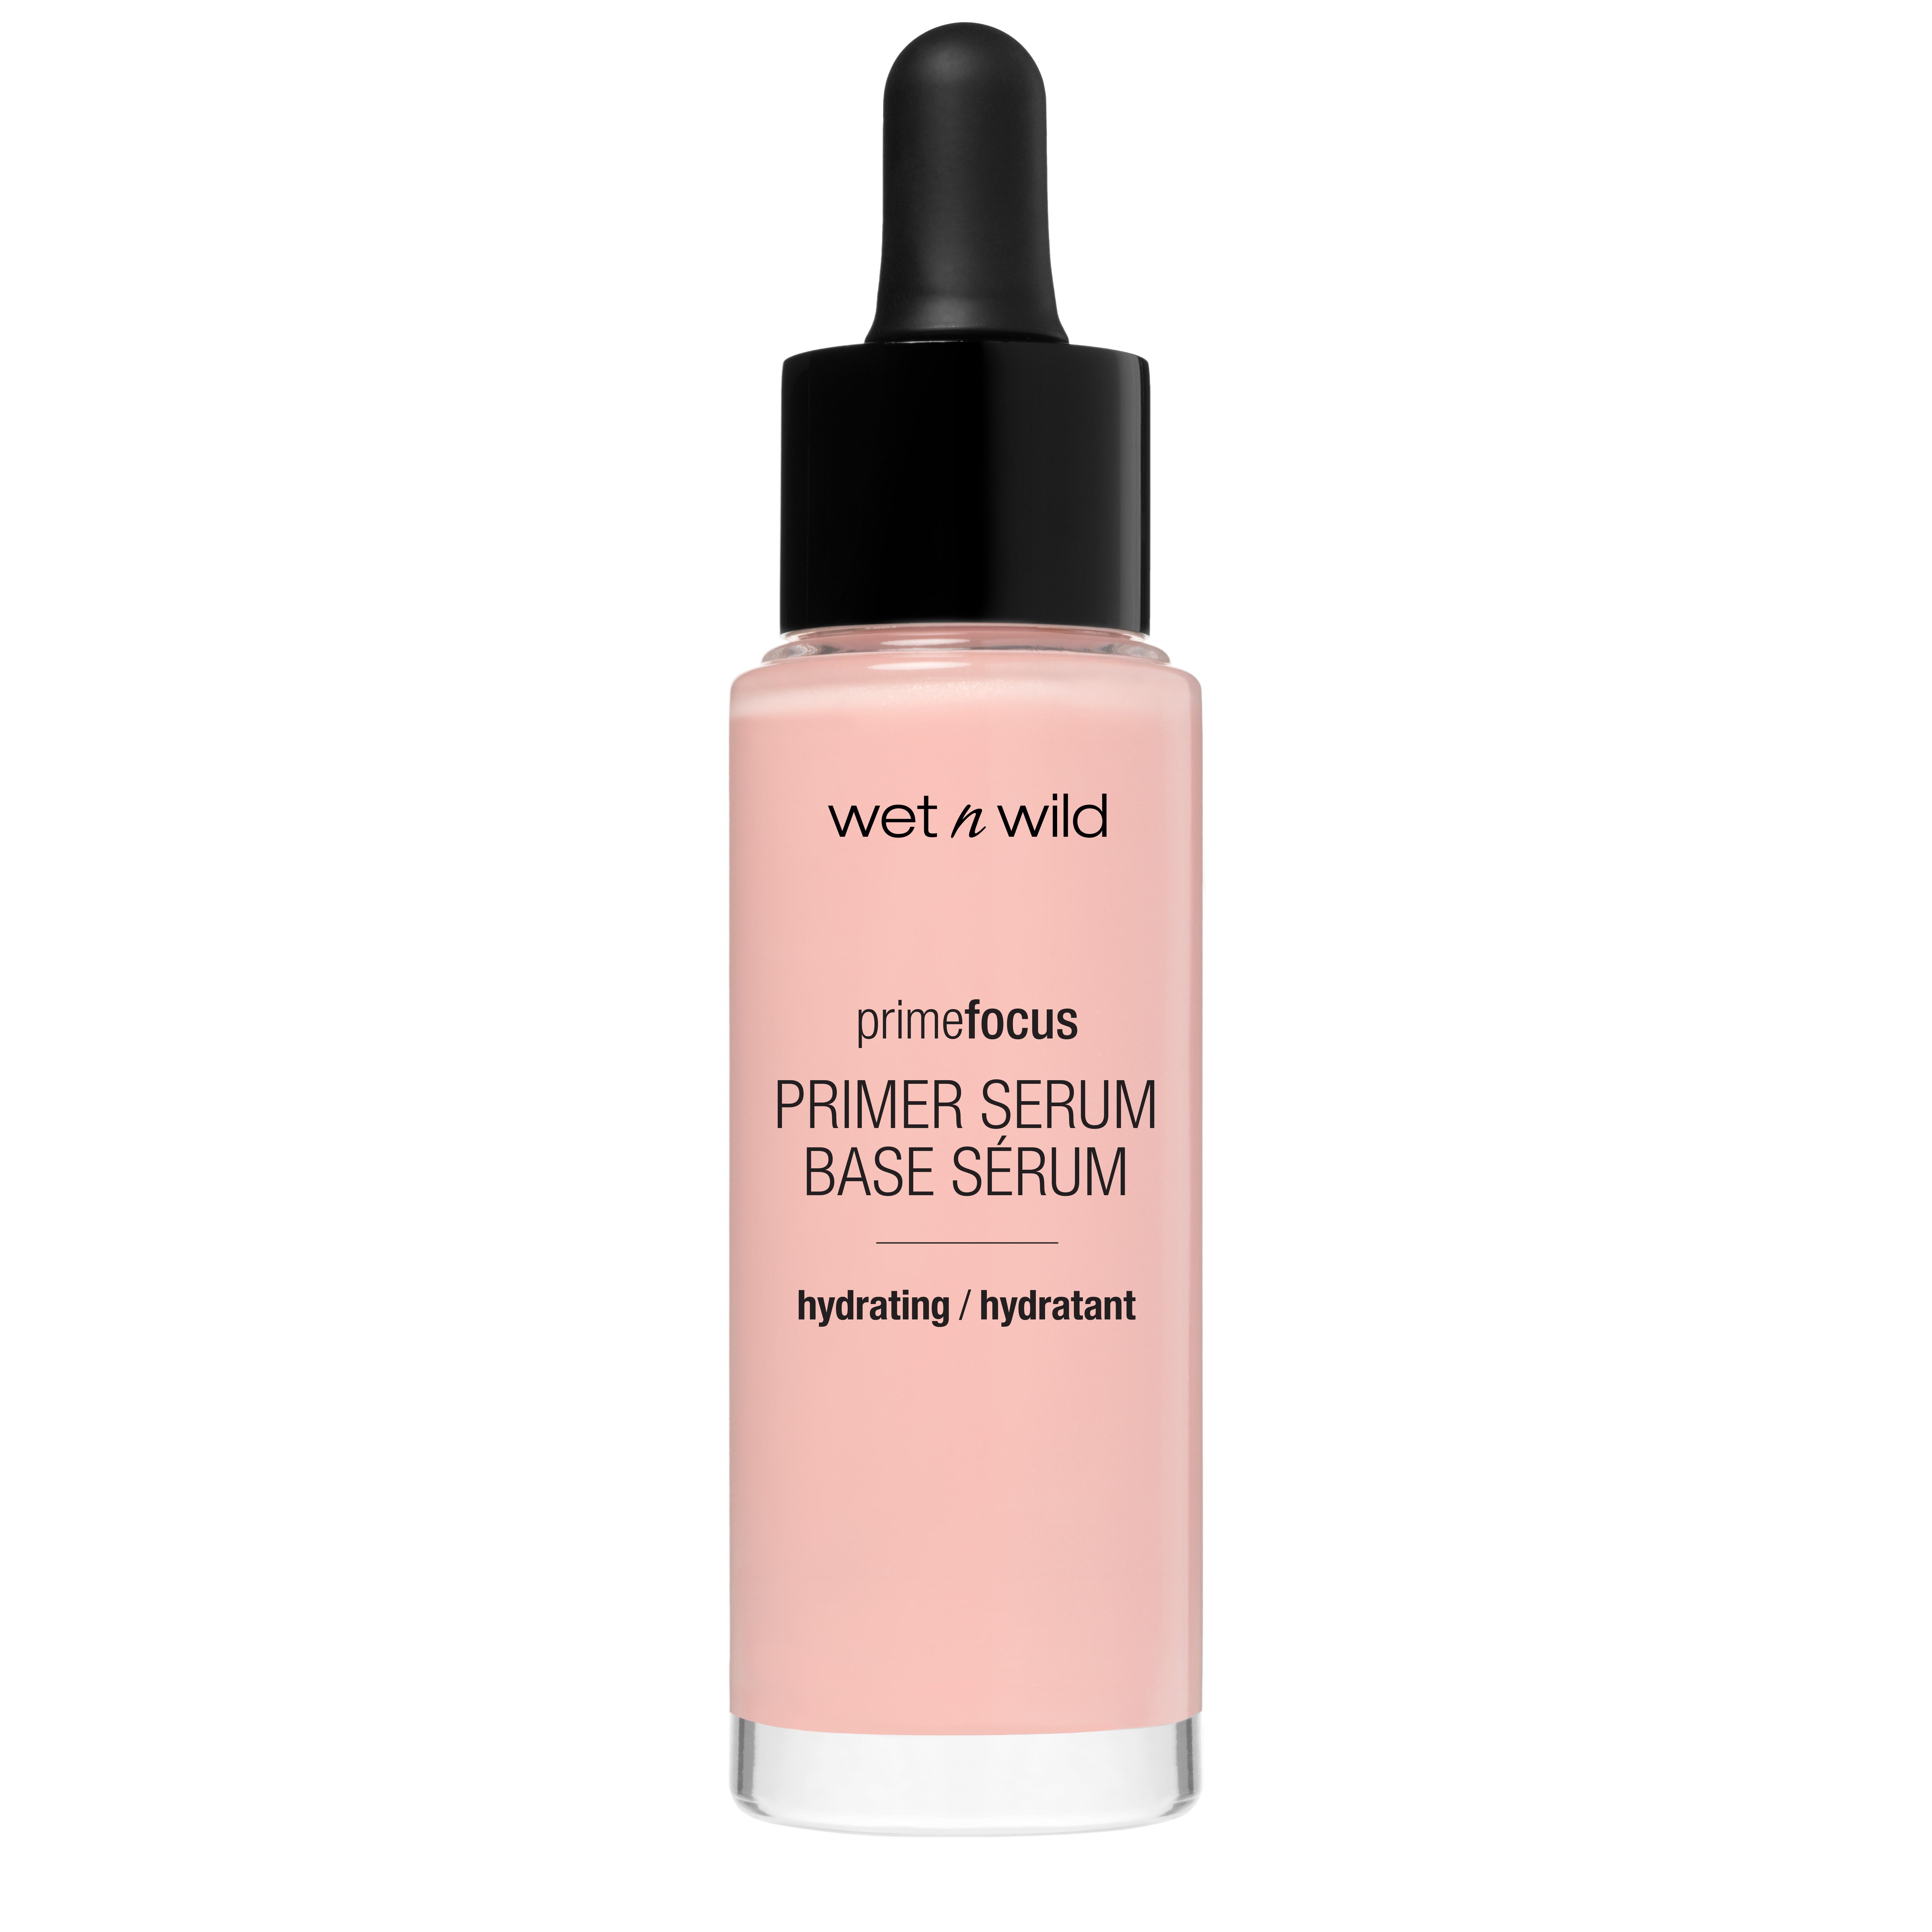 Wet n Wild Prime Focus Primer Sérum  Prebase de maquillaje ultra hidratante